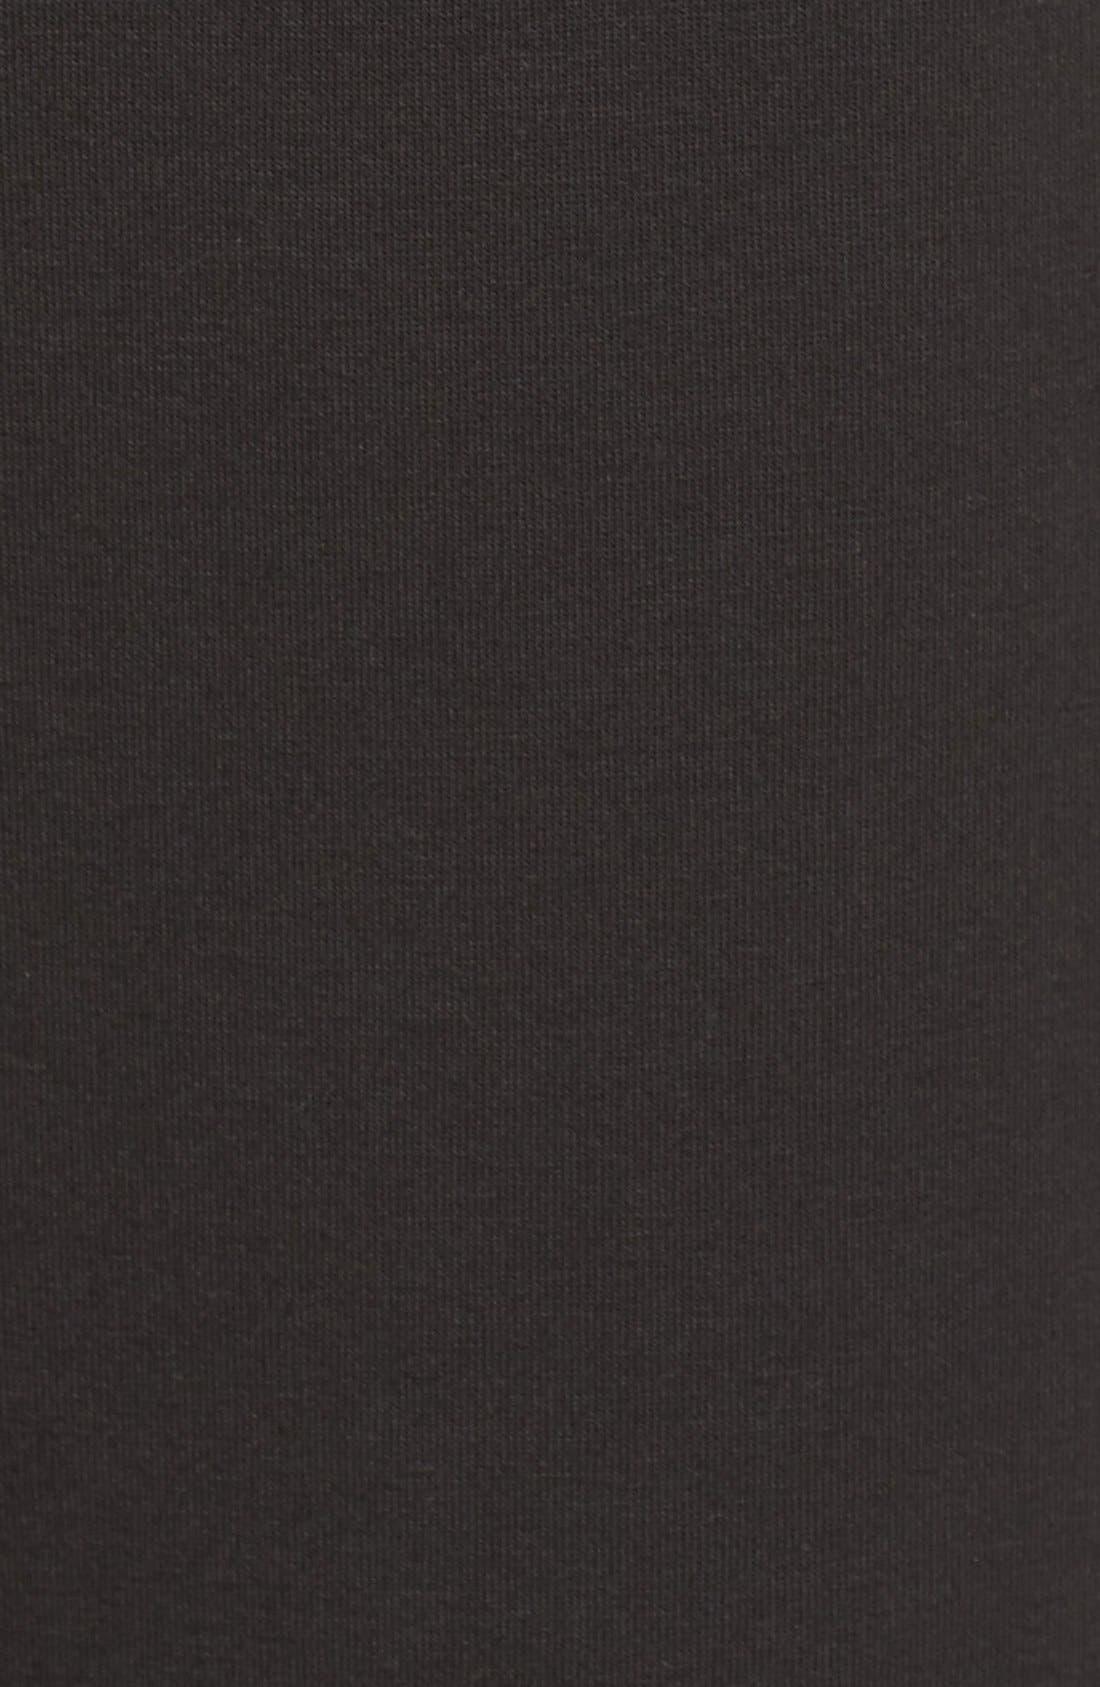 Luxe Lounge Sweatpants,                             Alternate thumbnail 5, color,                             001